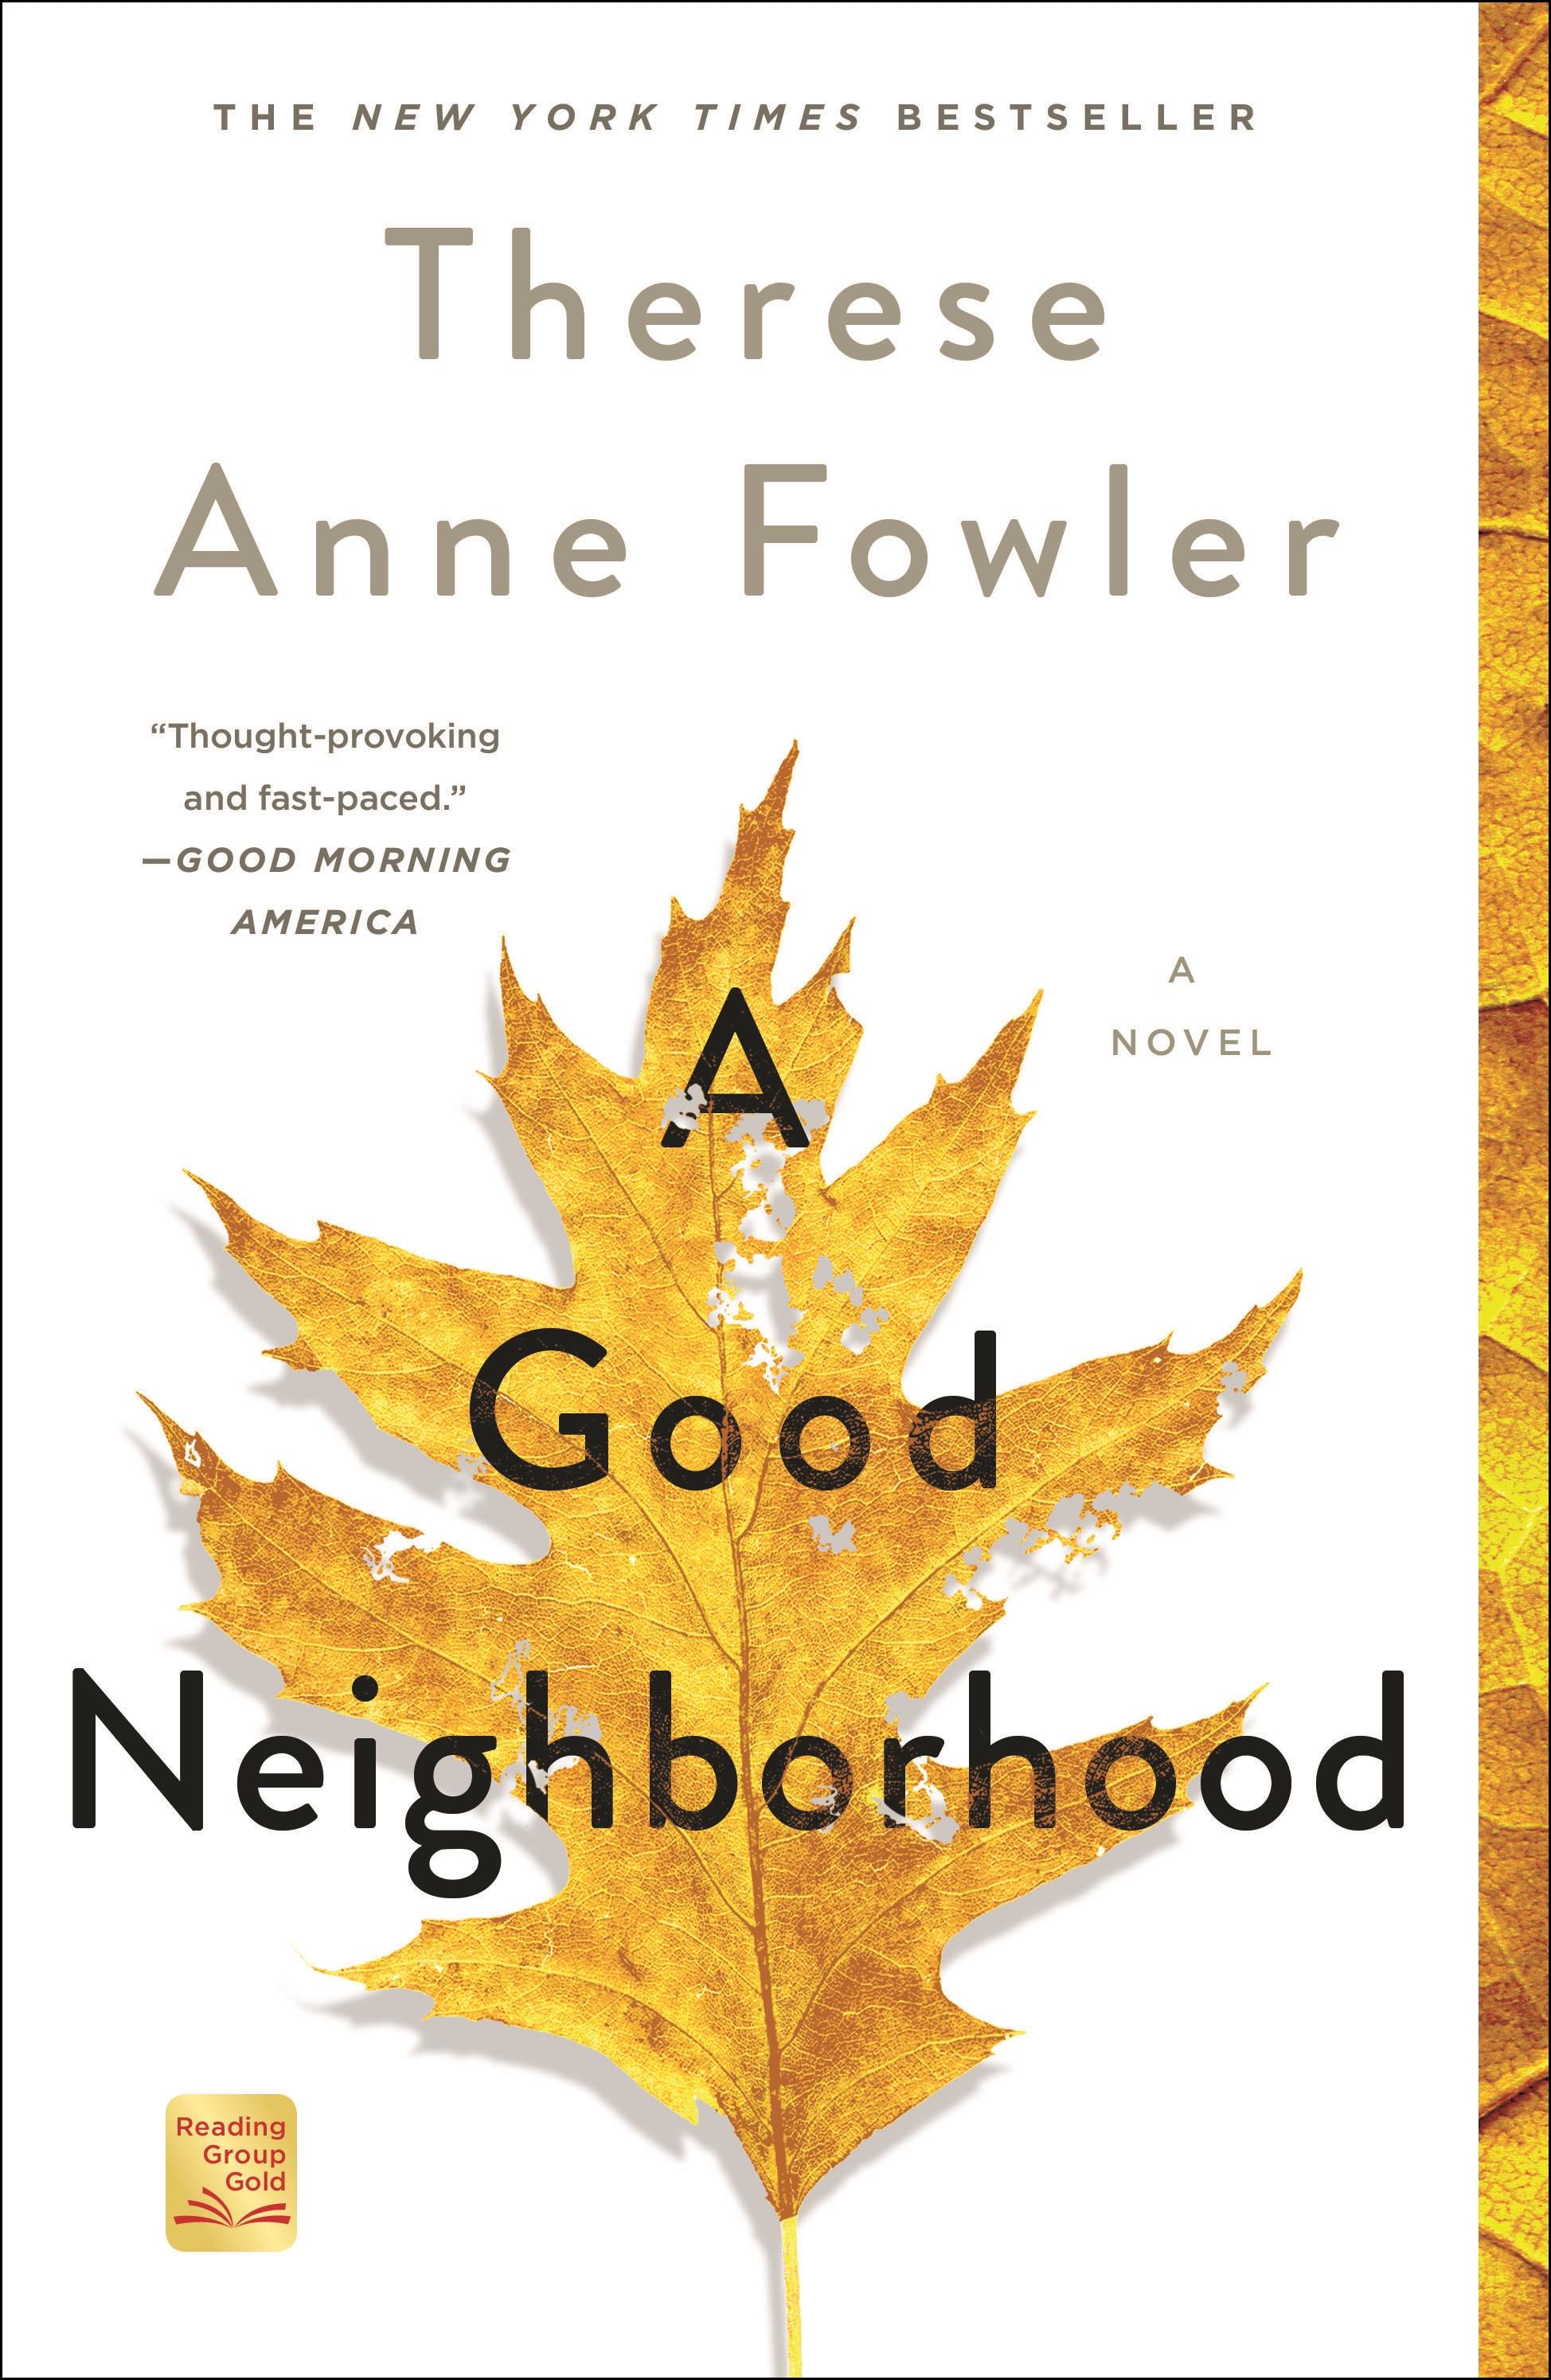 A good neighborhood cover image